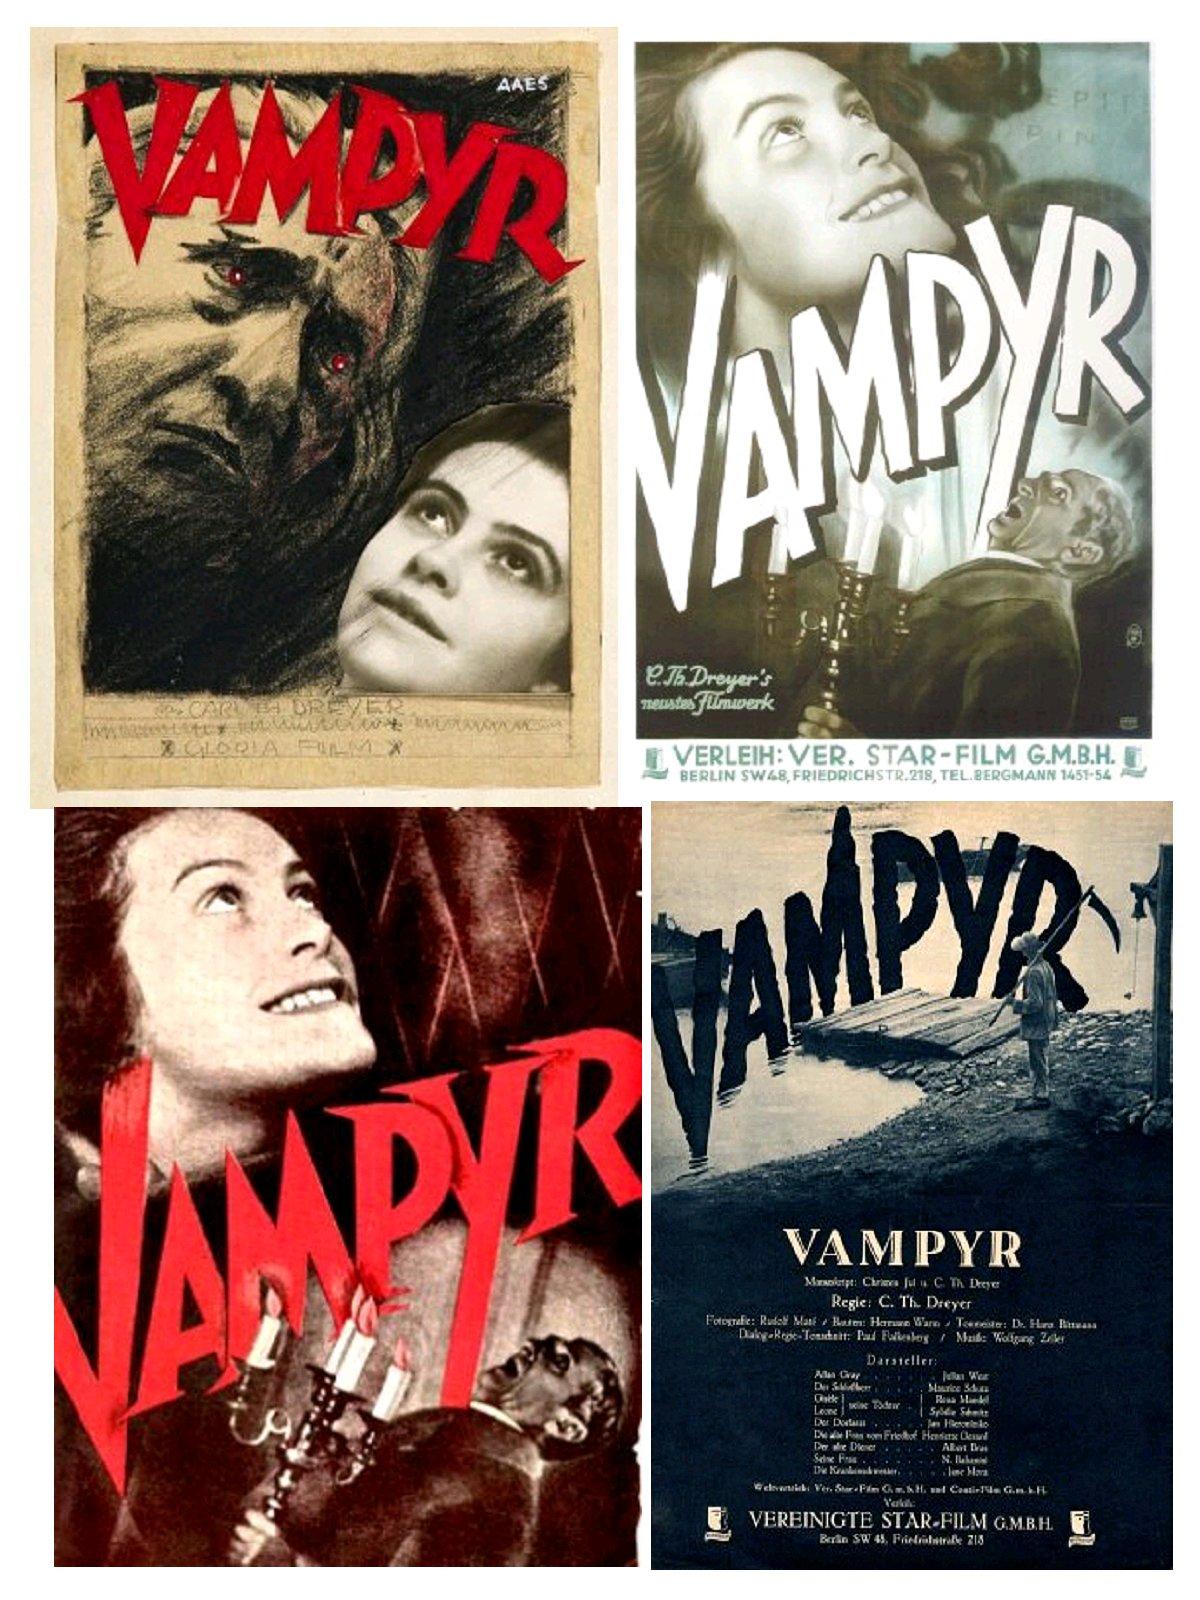 http://3.bp.blogspot.com/-zysq15iBeo4/TmSRfPisqzI/AAAAAAAACAU/hB6TXXDku24/s1600/vampyr%2Bgiveaway.jpg